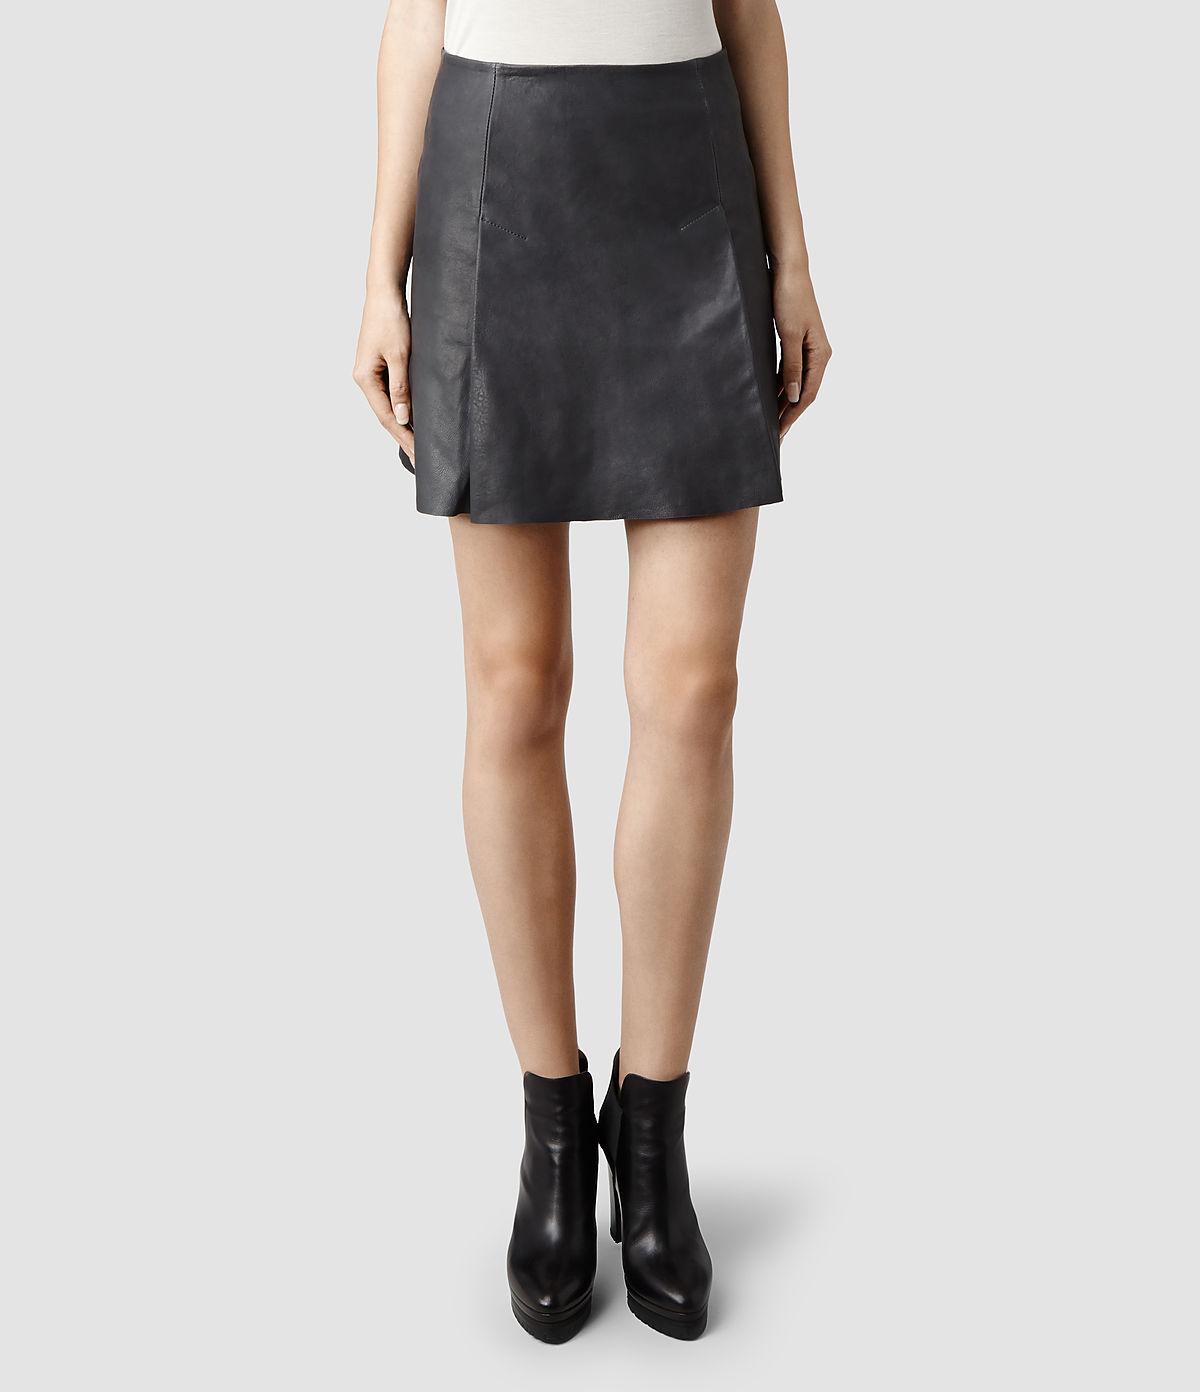 allsaints olvera leather skirt in blue petrol lyst